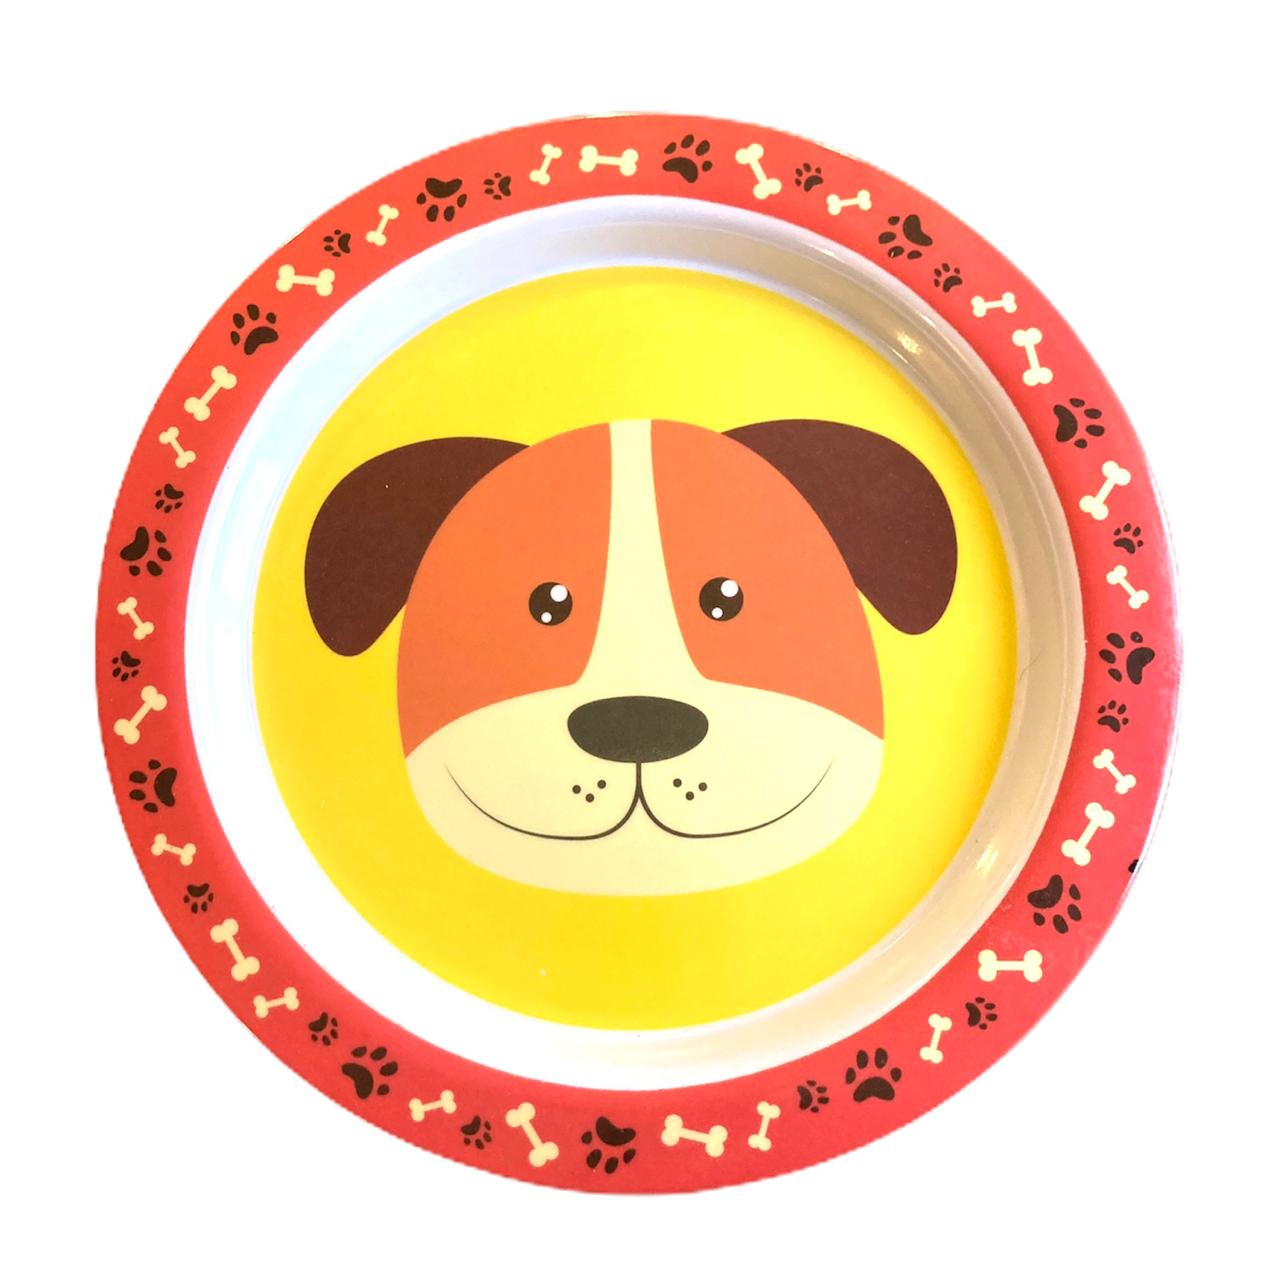 Prato Cachorro Redondo